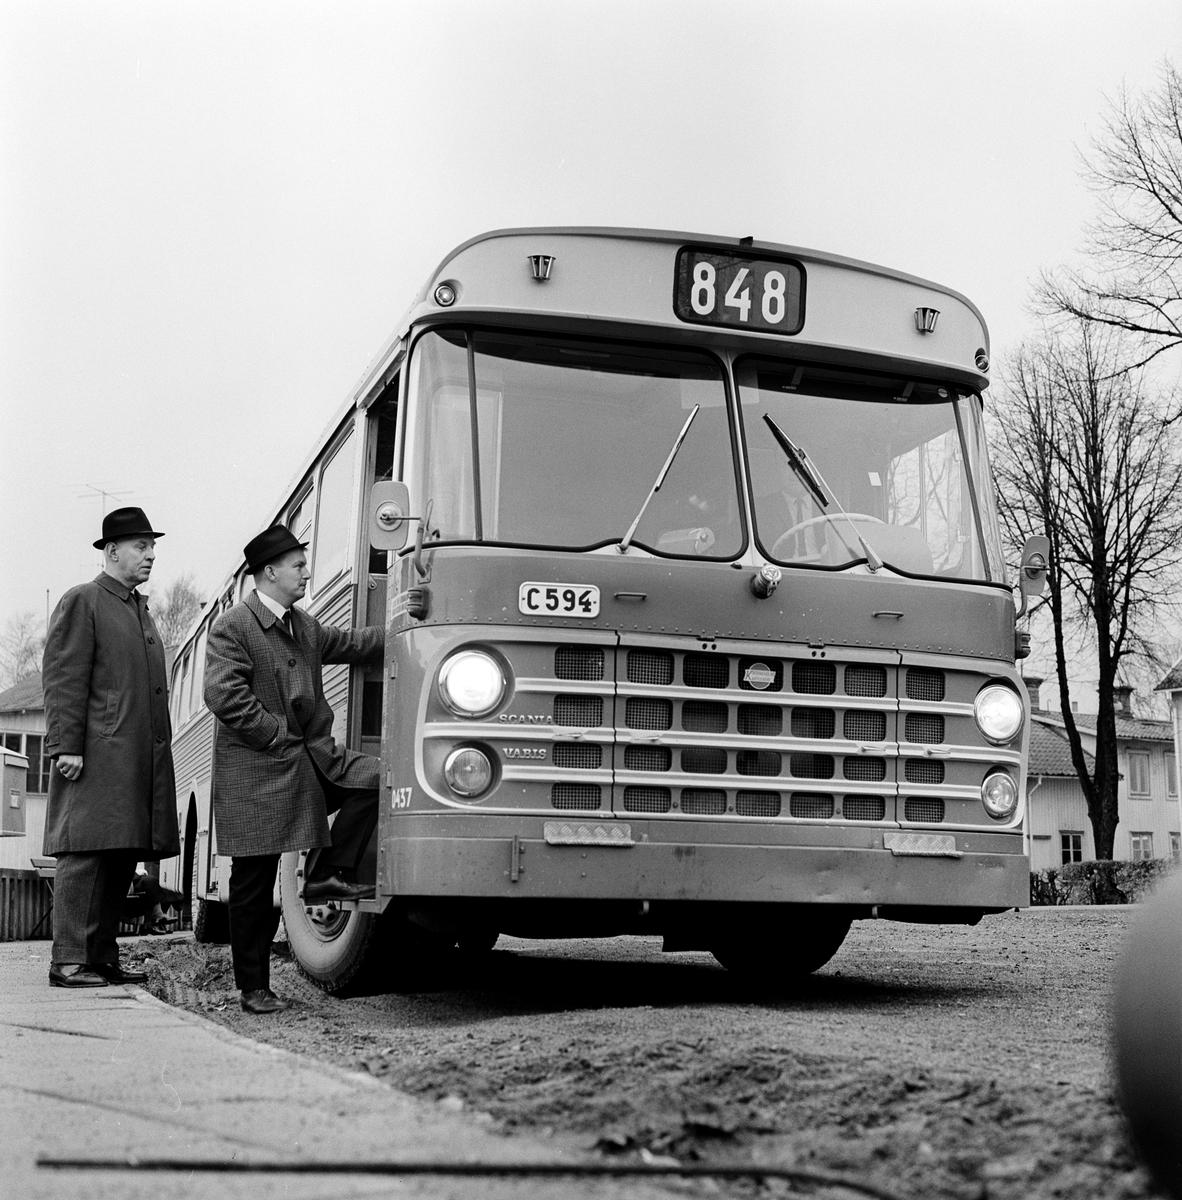 Linje 848. Busstrafik Uppsala - Heby - Sala